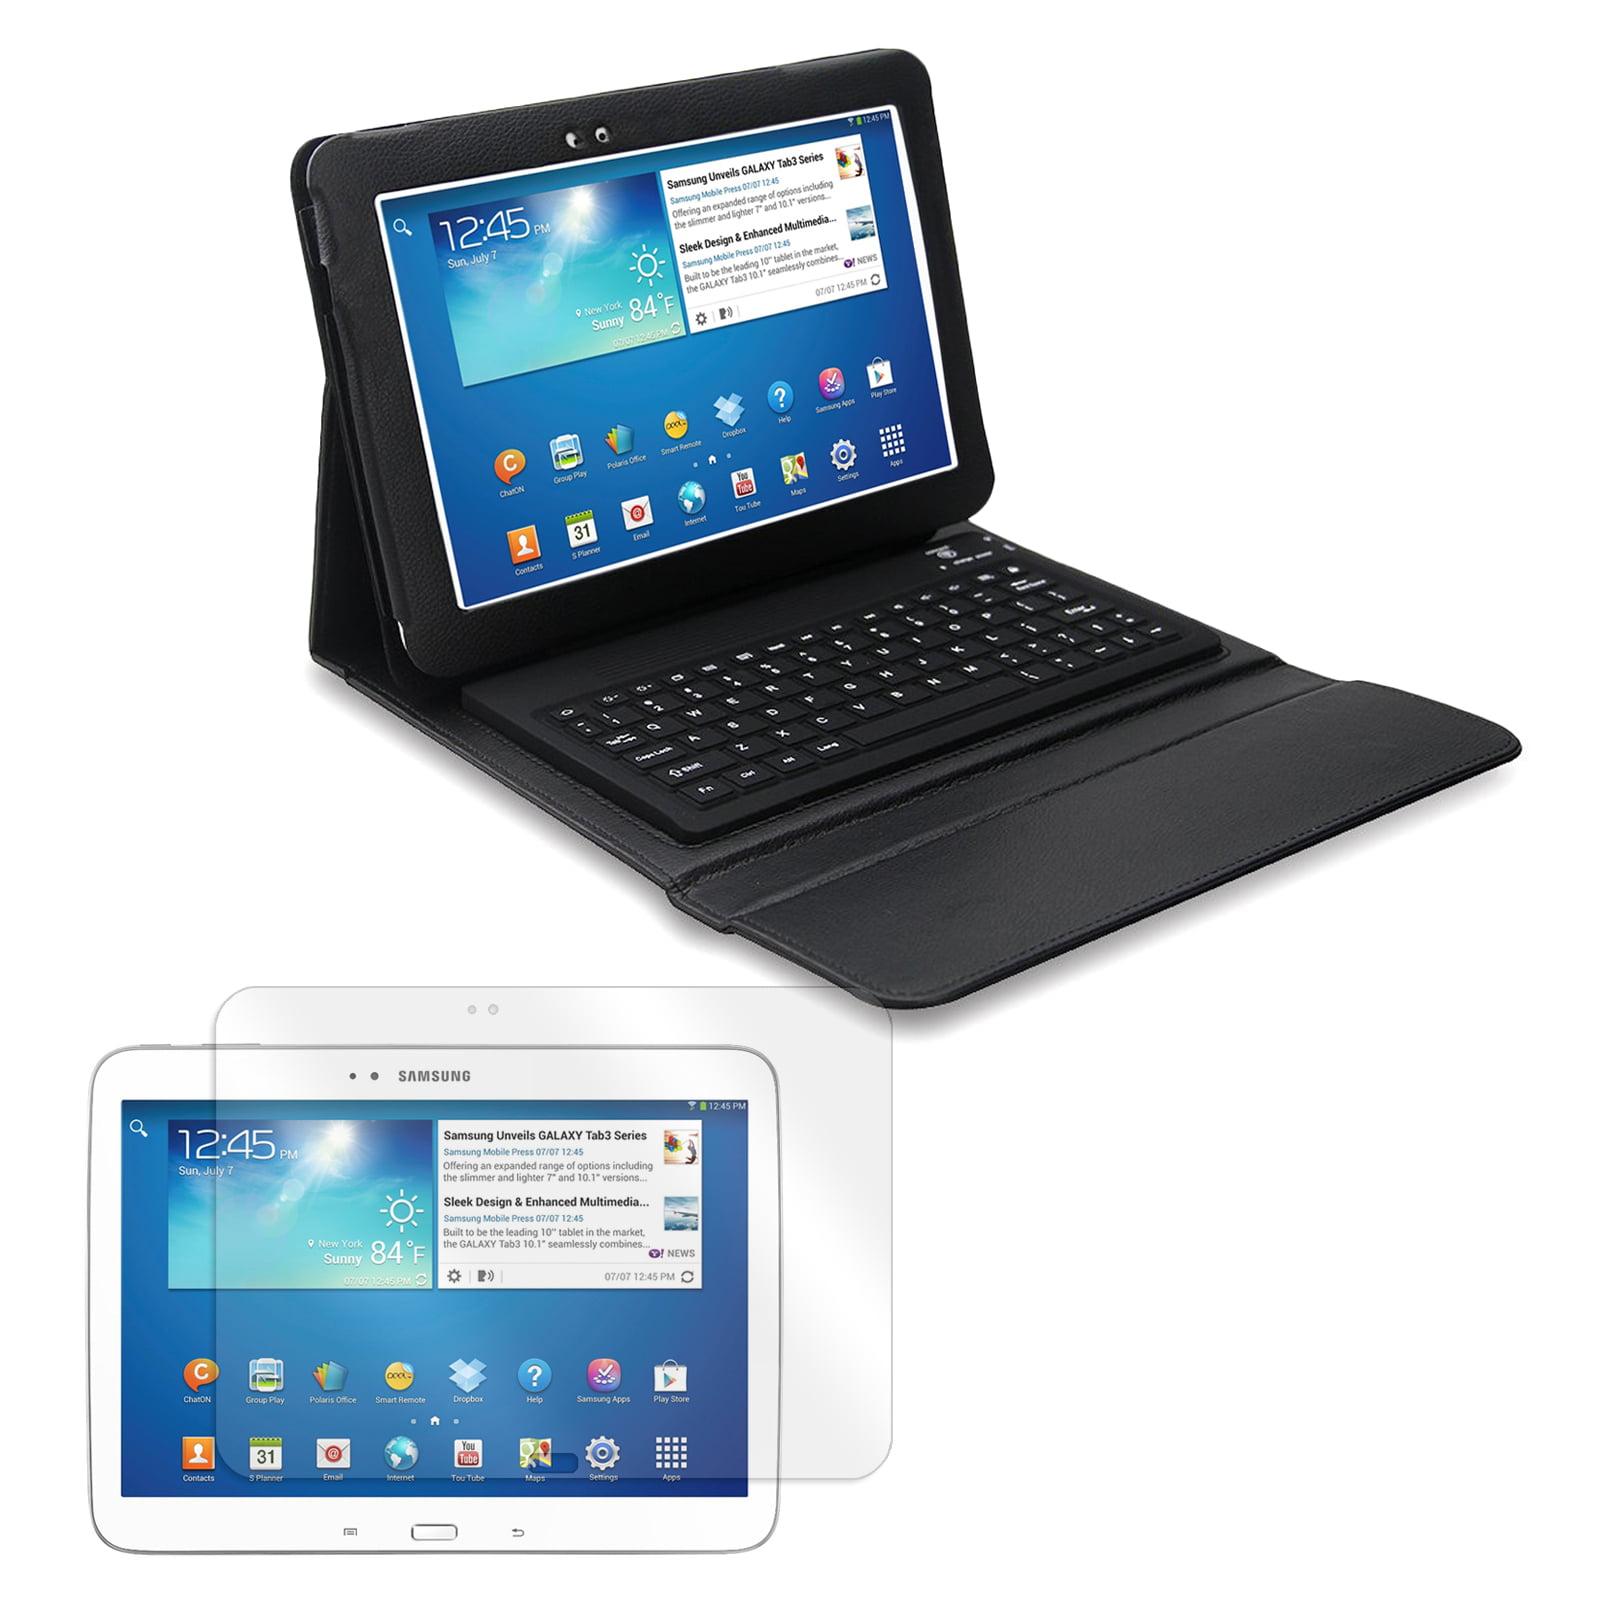 "Bluetooth Keyboard Folio with Screen Protector for Samsung Galaxy Tab 3 10.1"" Tablet"